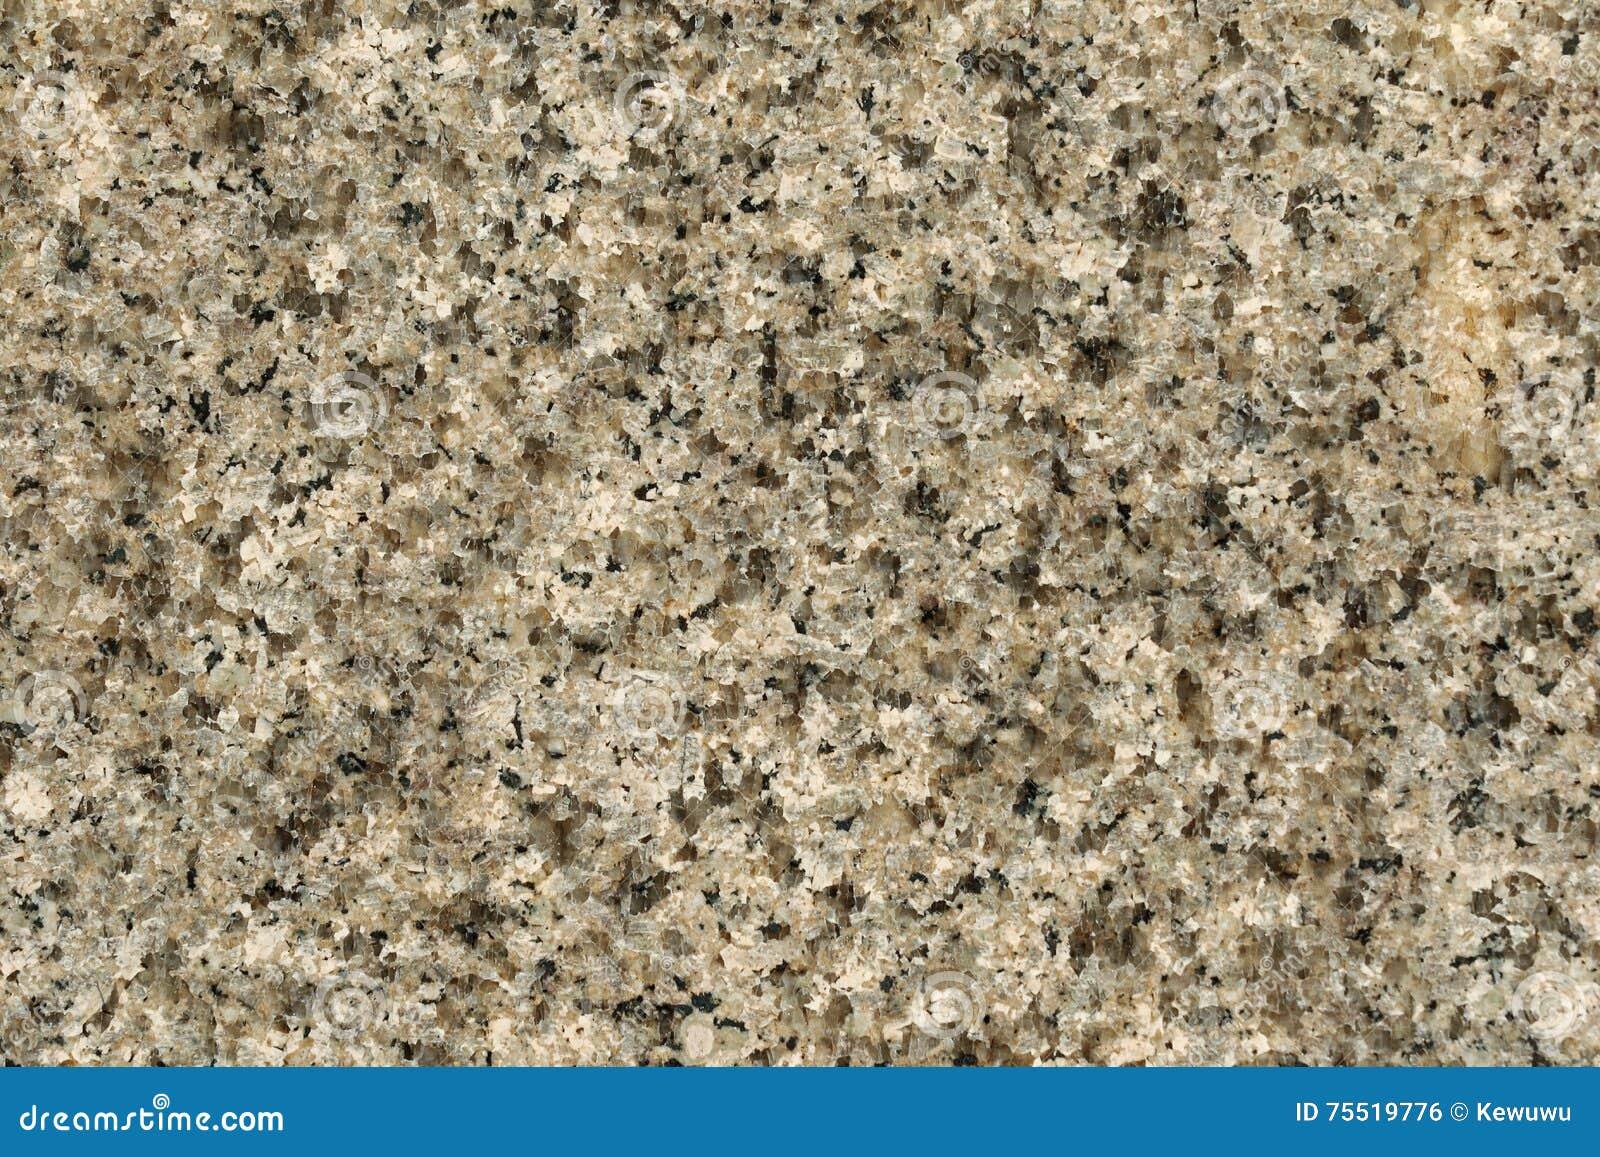 Natural Granite Rock : Texture of polished granite rock in gray black background